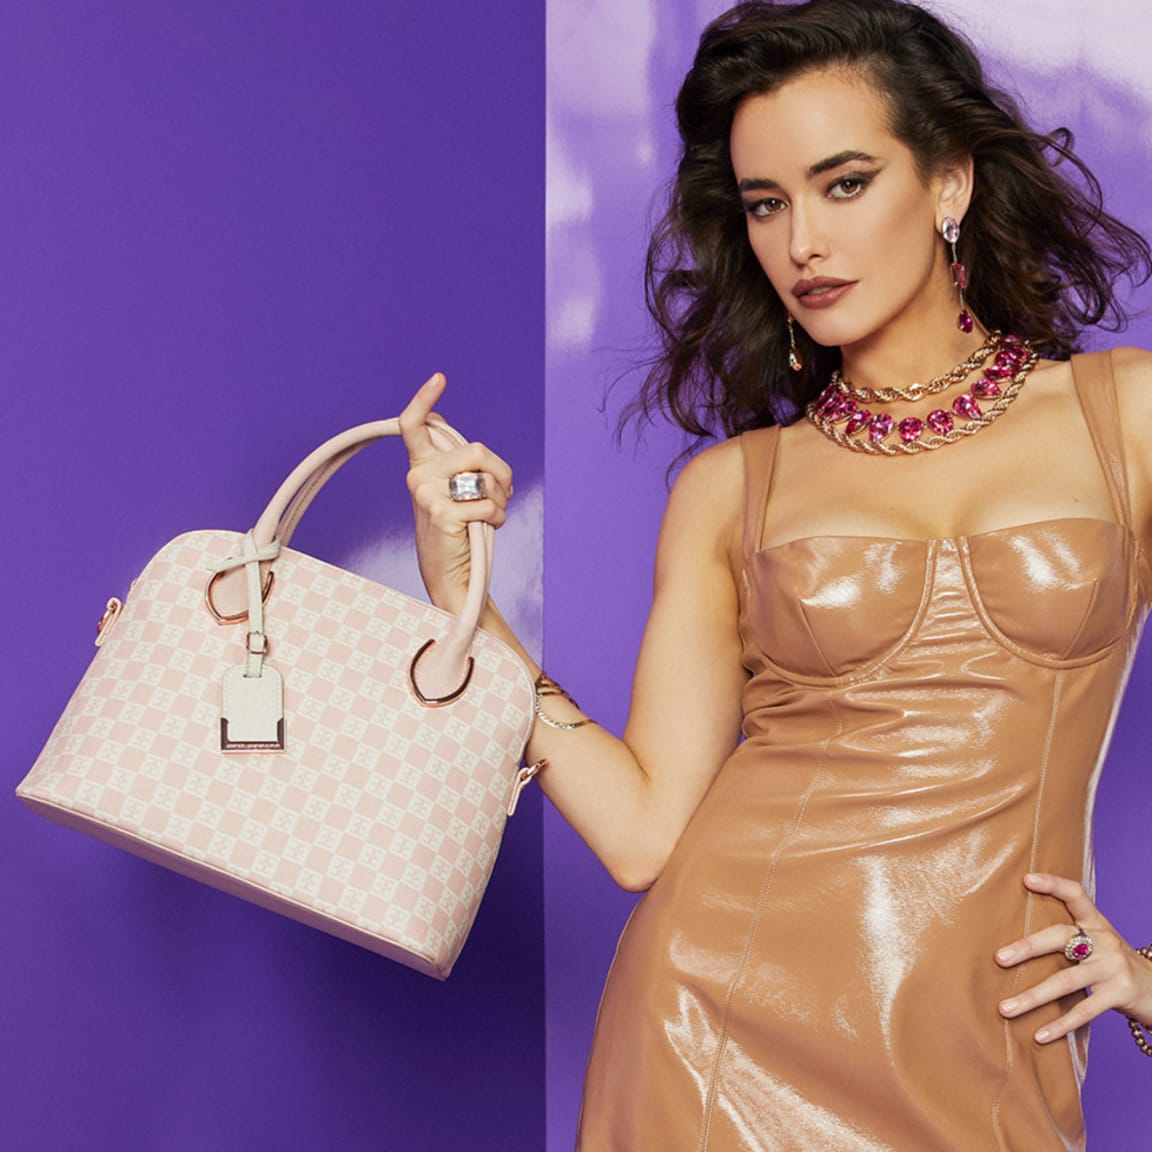 Colette by Colette Hayman: 50% off second bag